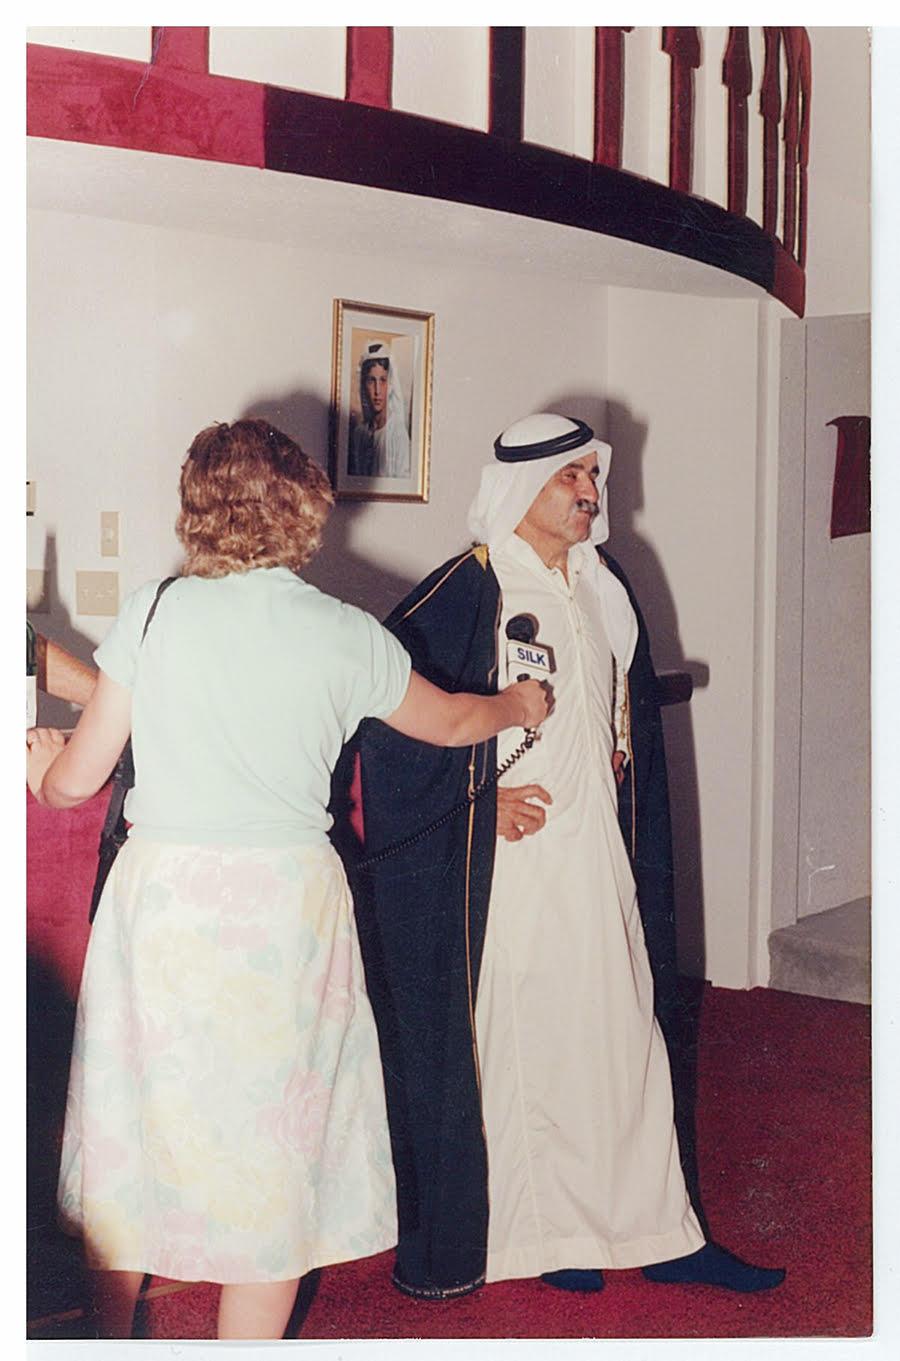 Eddy Haymour in Middle East